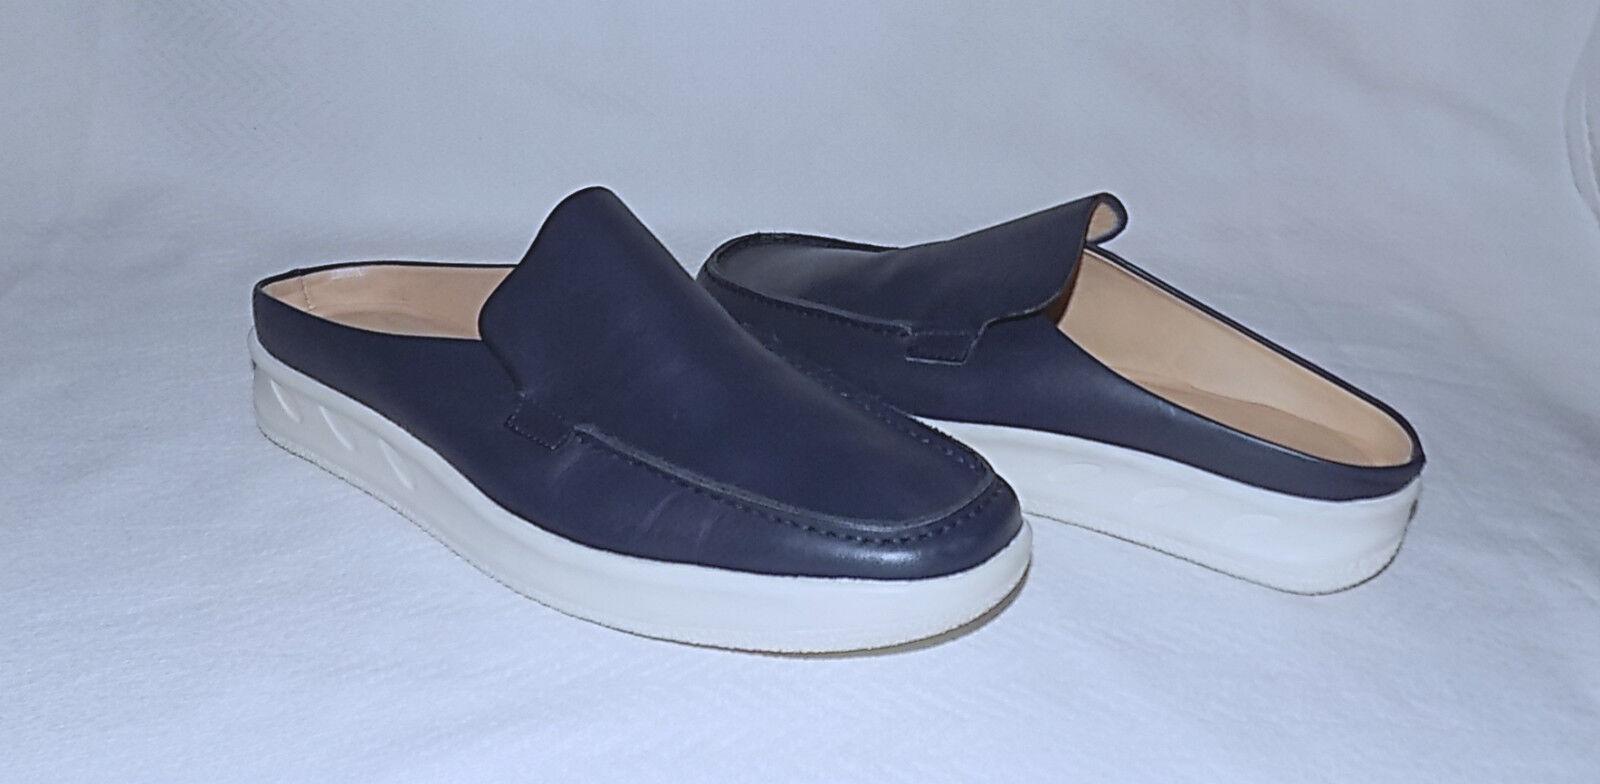 Nike tanjun Racer señora zapatillas de Trainers deporte zapatillas para correr zapatillas Trainers de fitness 4076 512d4b